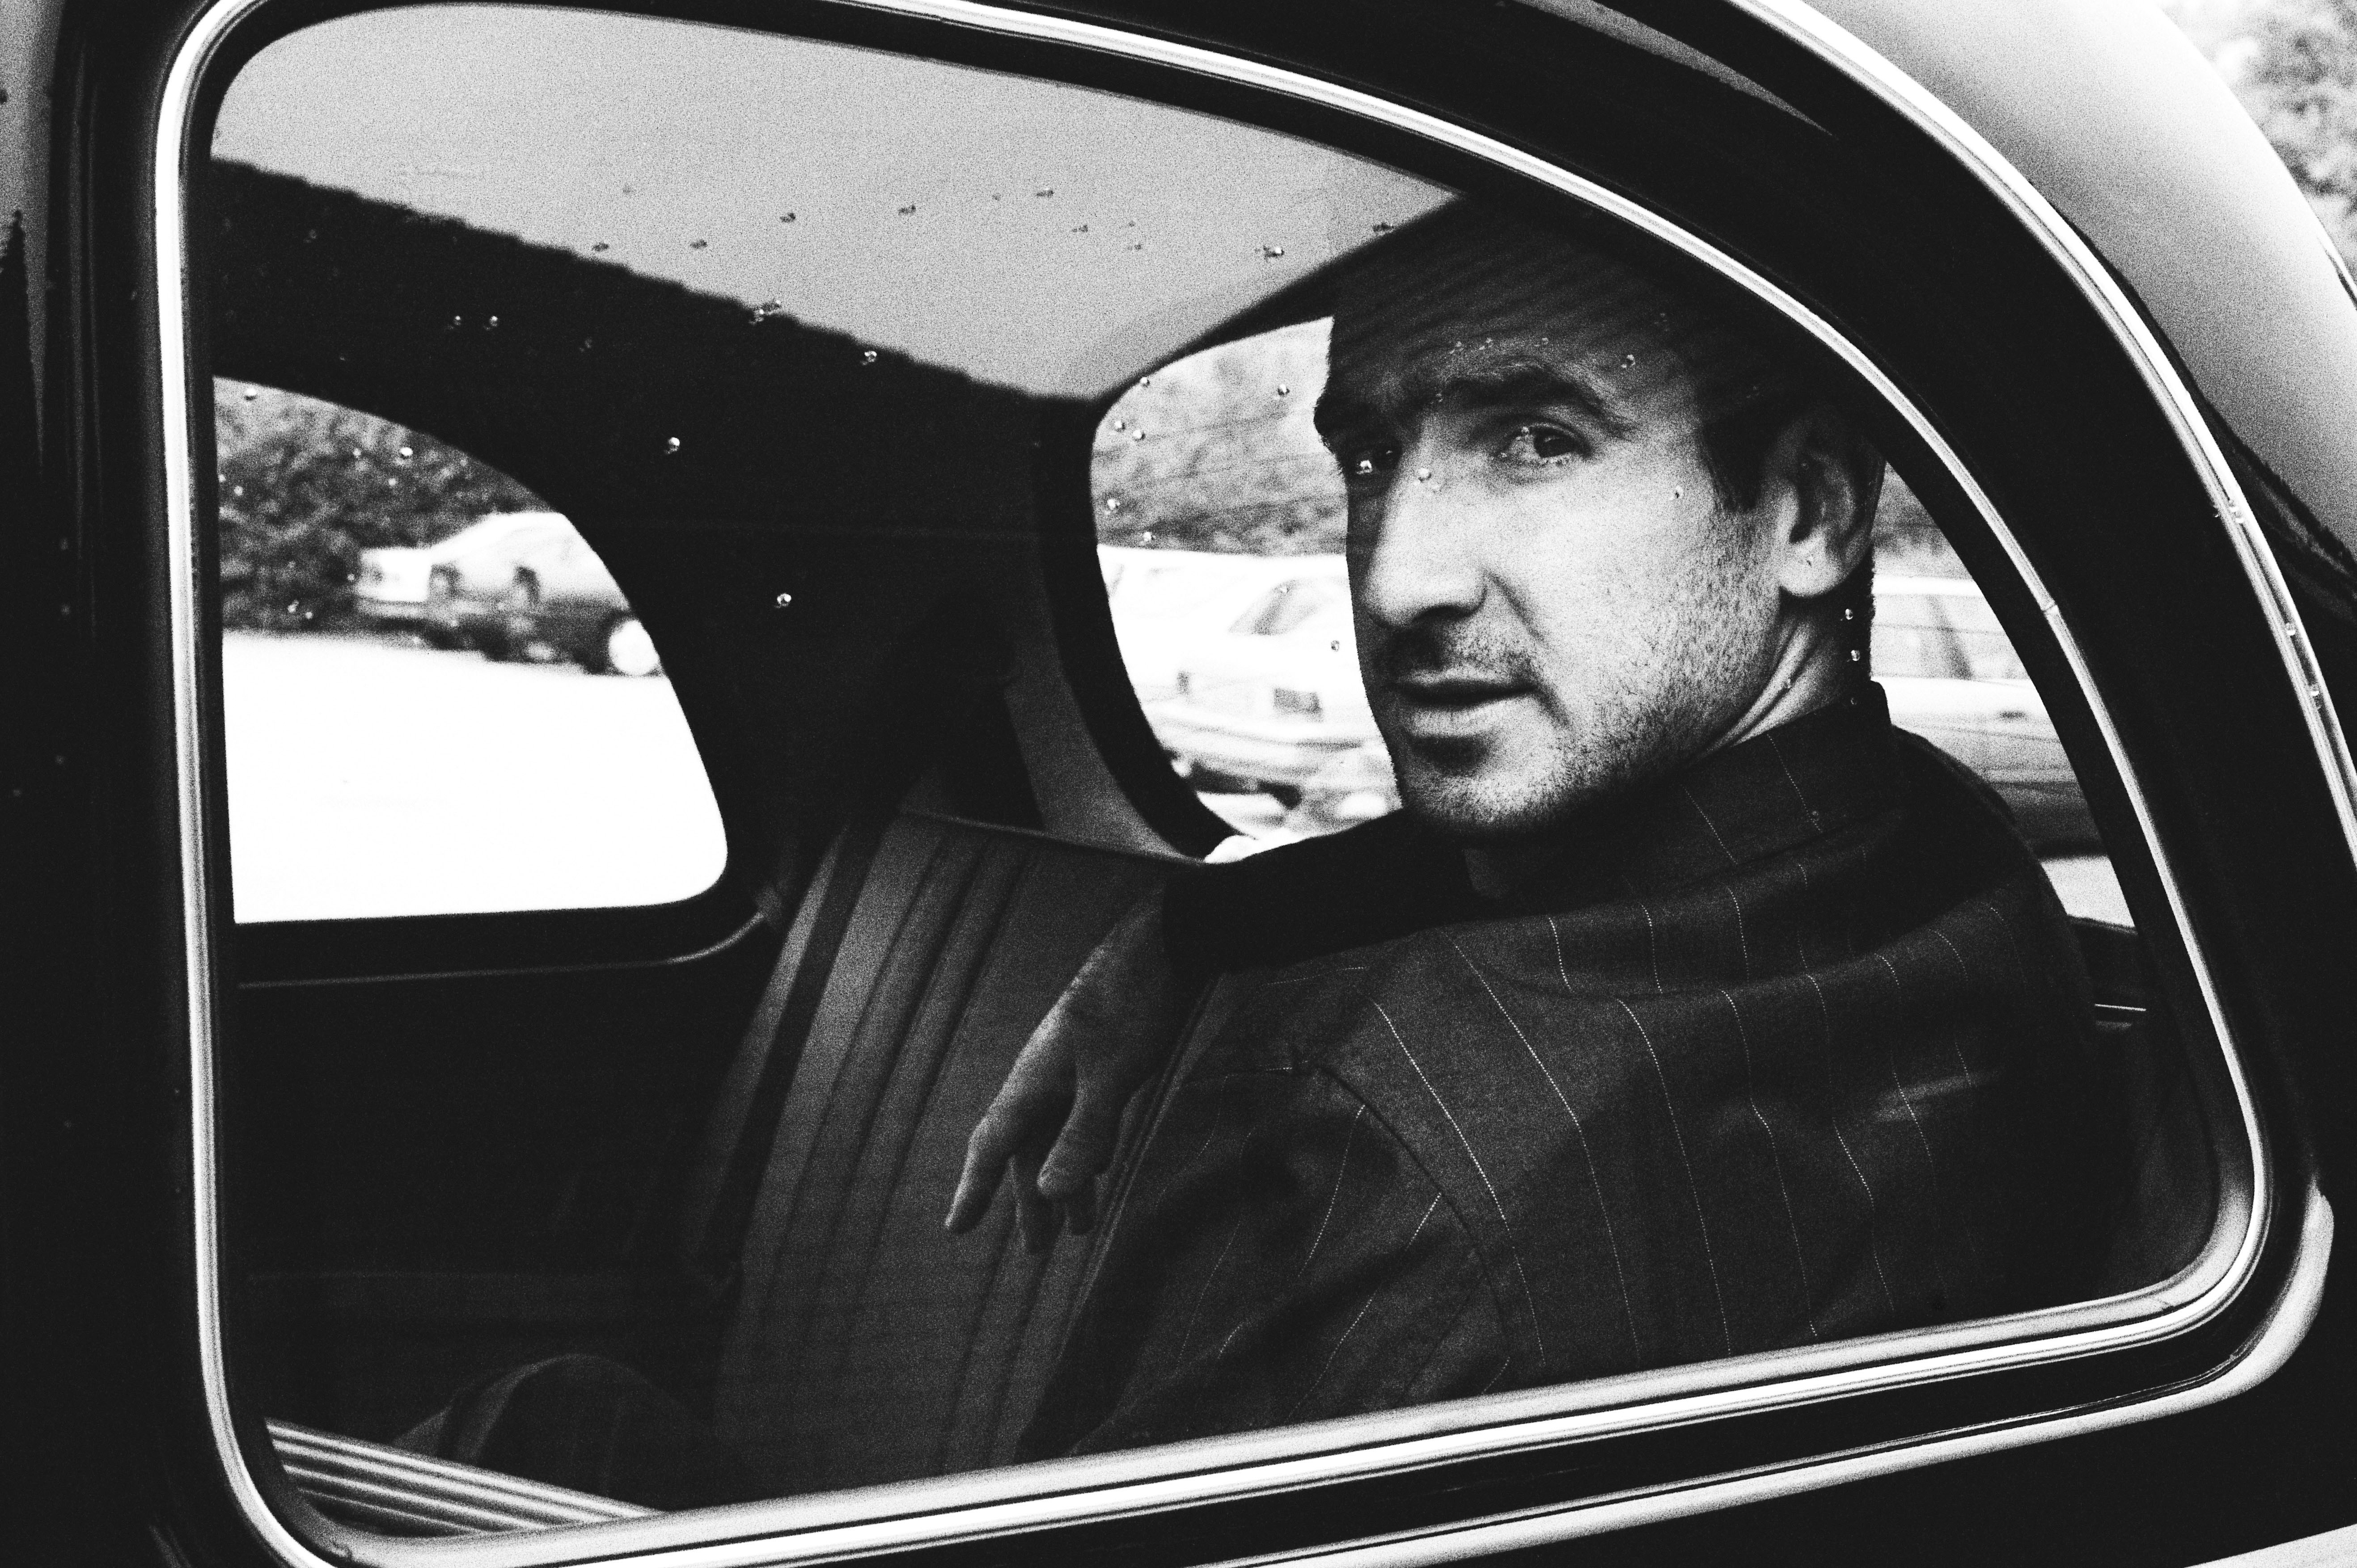 King 7 – Eric Cantona